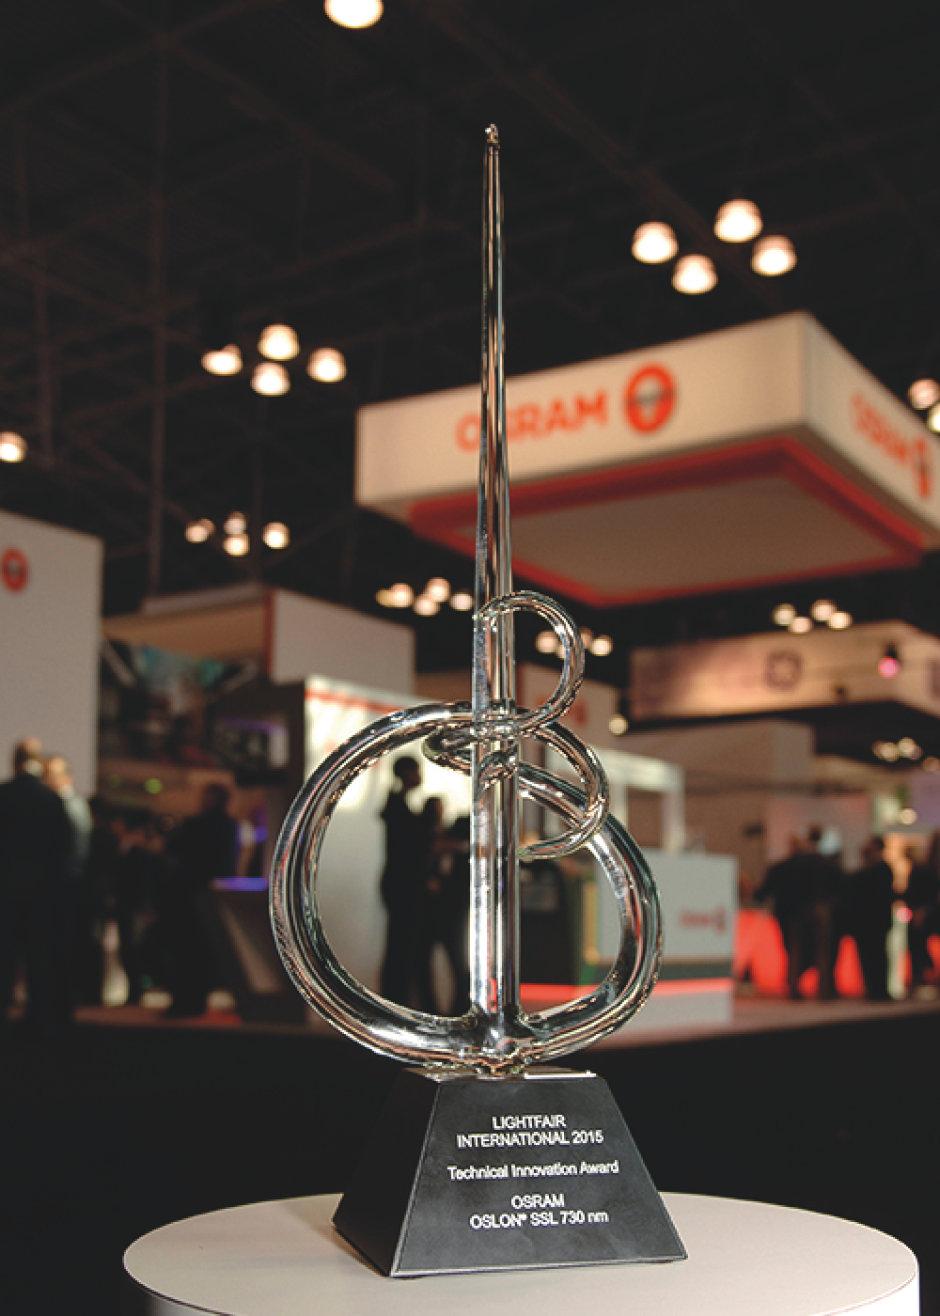 Osram Oslon SSL 730nm wins two innovation awards at LIGHTFAIR International 2015